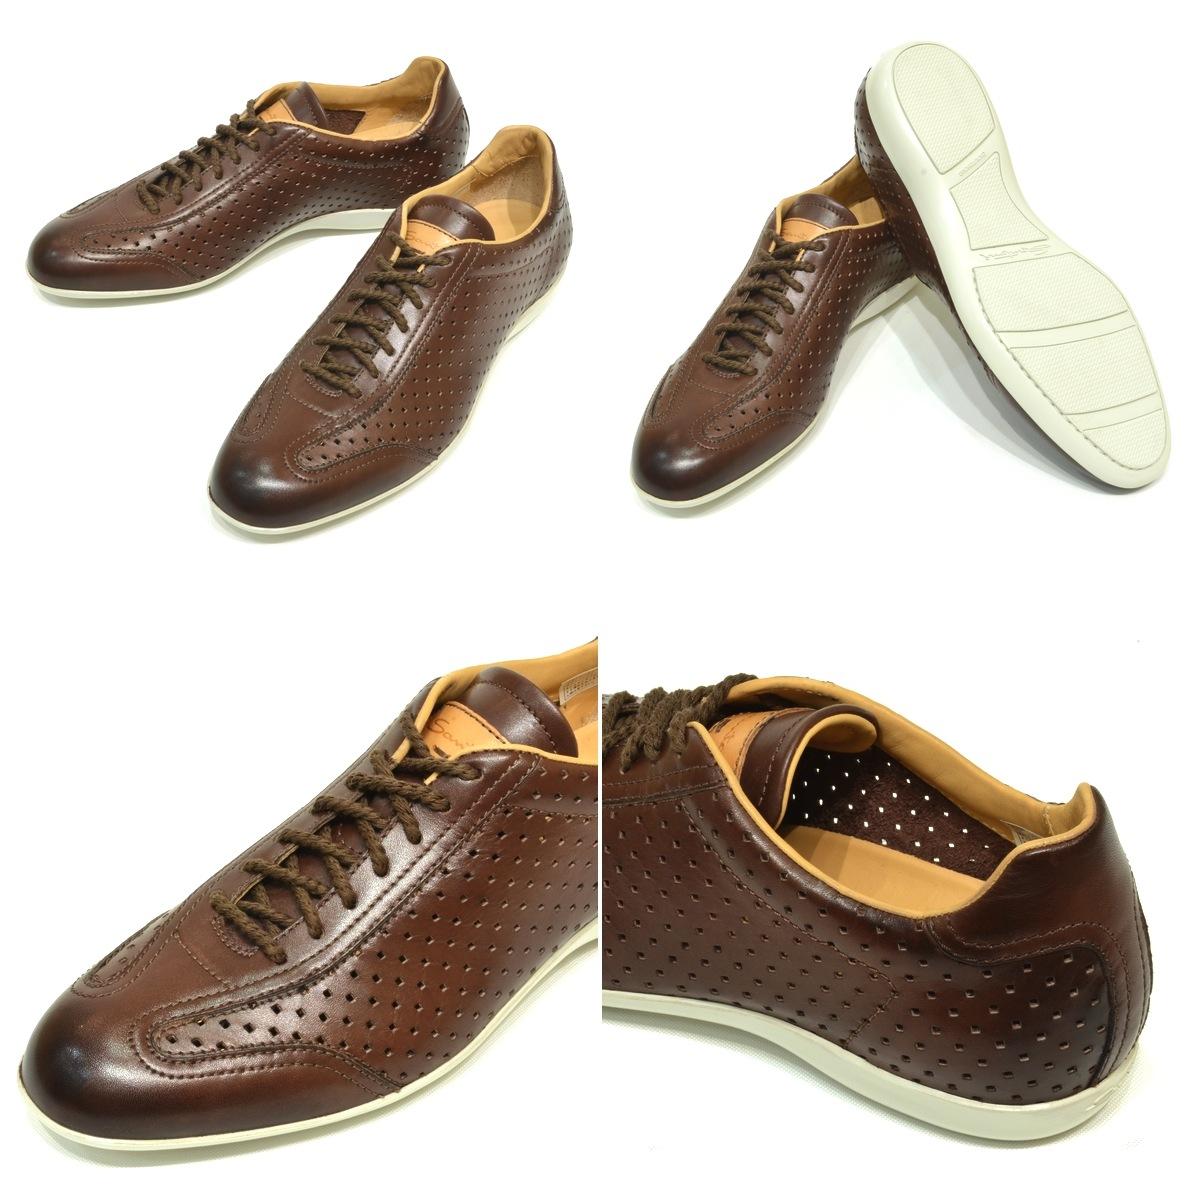 SANTONI 冲孔皮革制品运动鞋1382615251001019